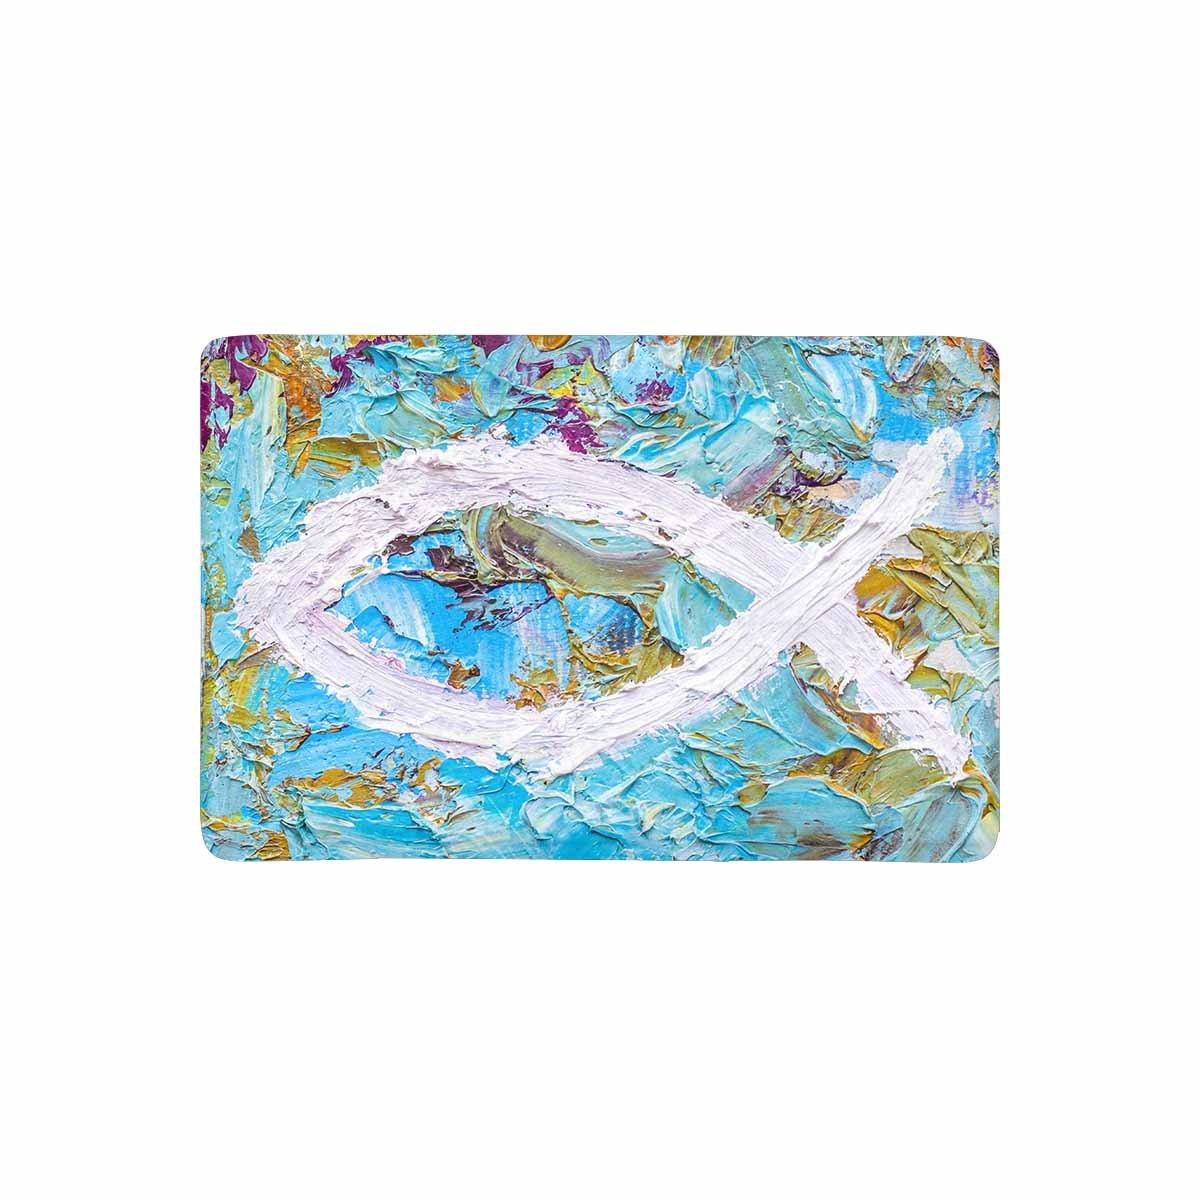 InterestPrint Colorful Christian Fish Christian Symbol Doormat Non Slip Indoor/Outdoor Doormat Floor Mat Home Decor, Entrance Rug Rubber Backing 23.6''(L) x 15.7''(W) by InterestPrint